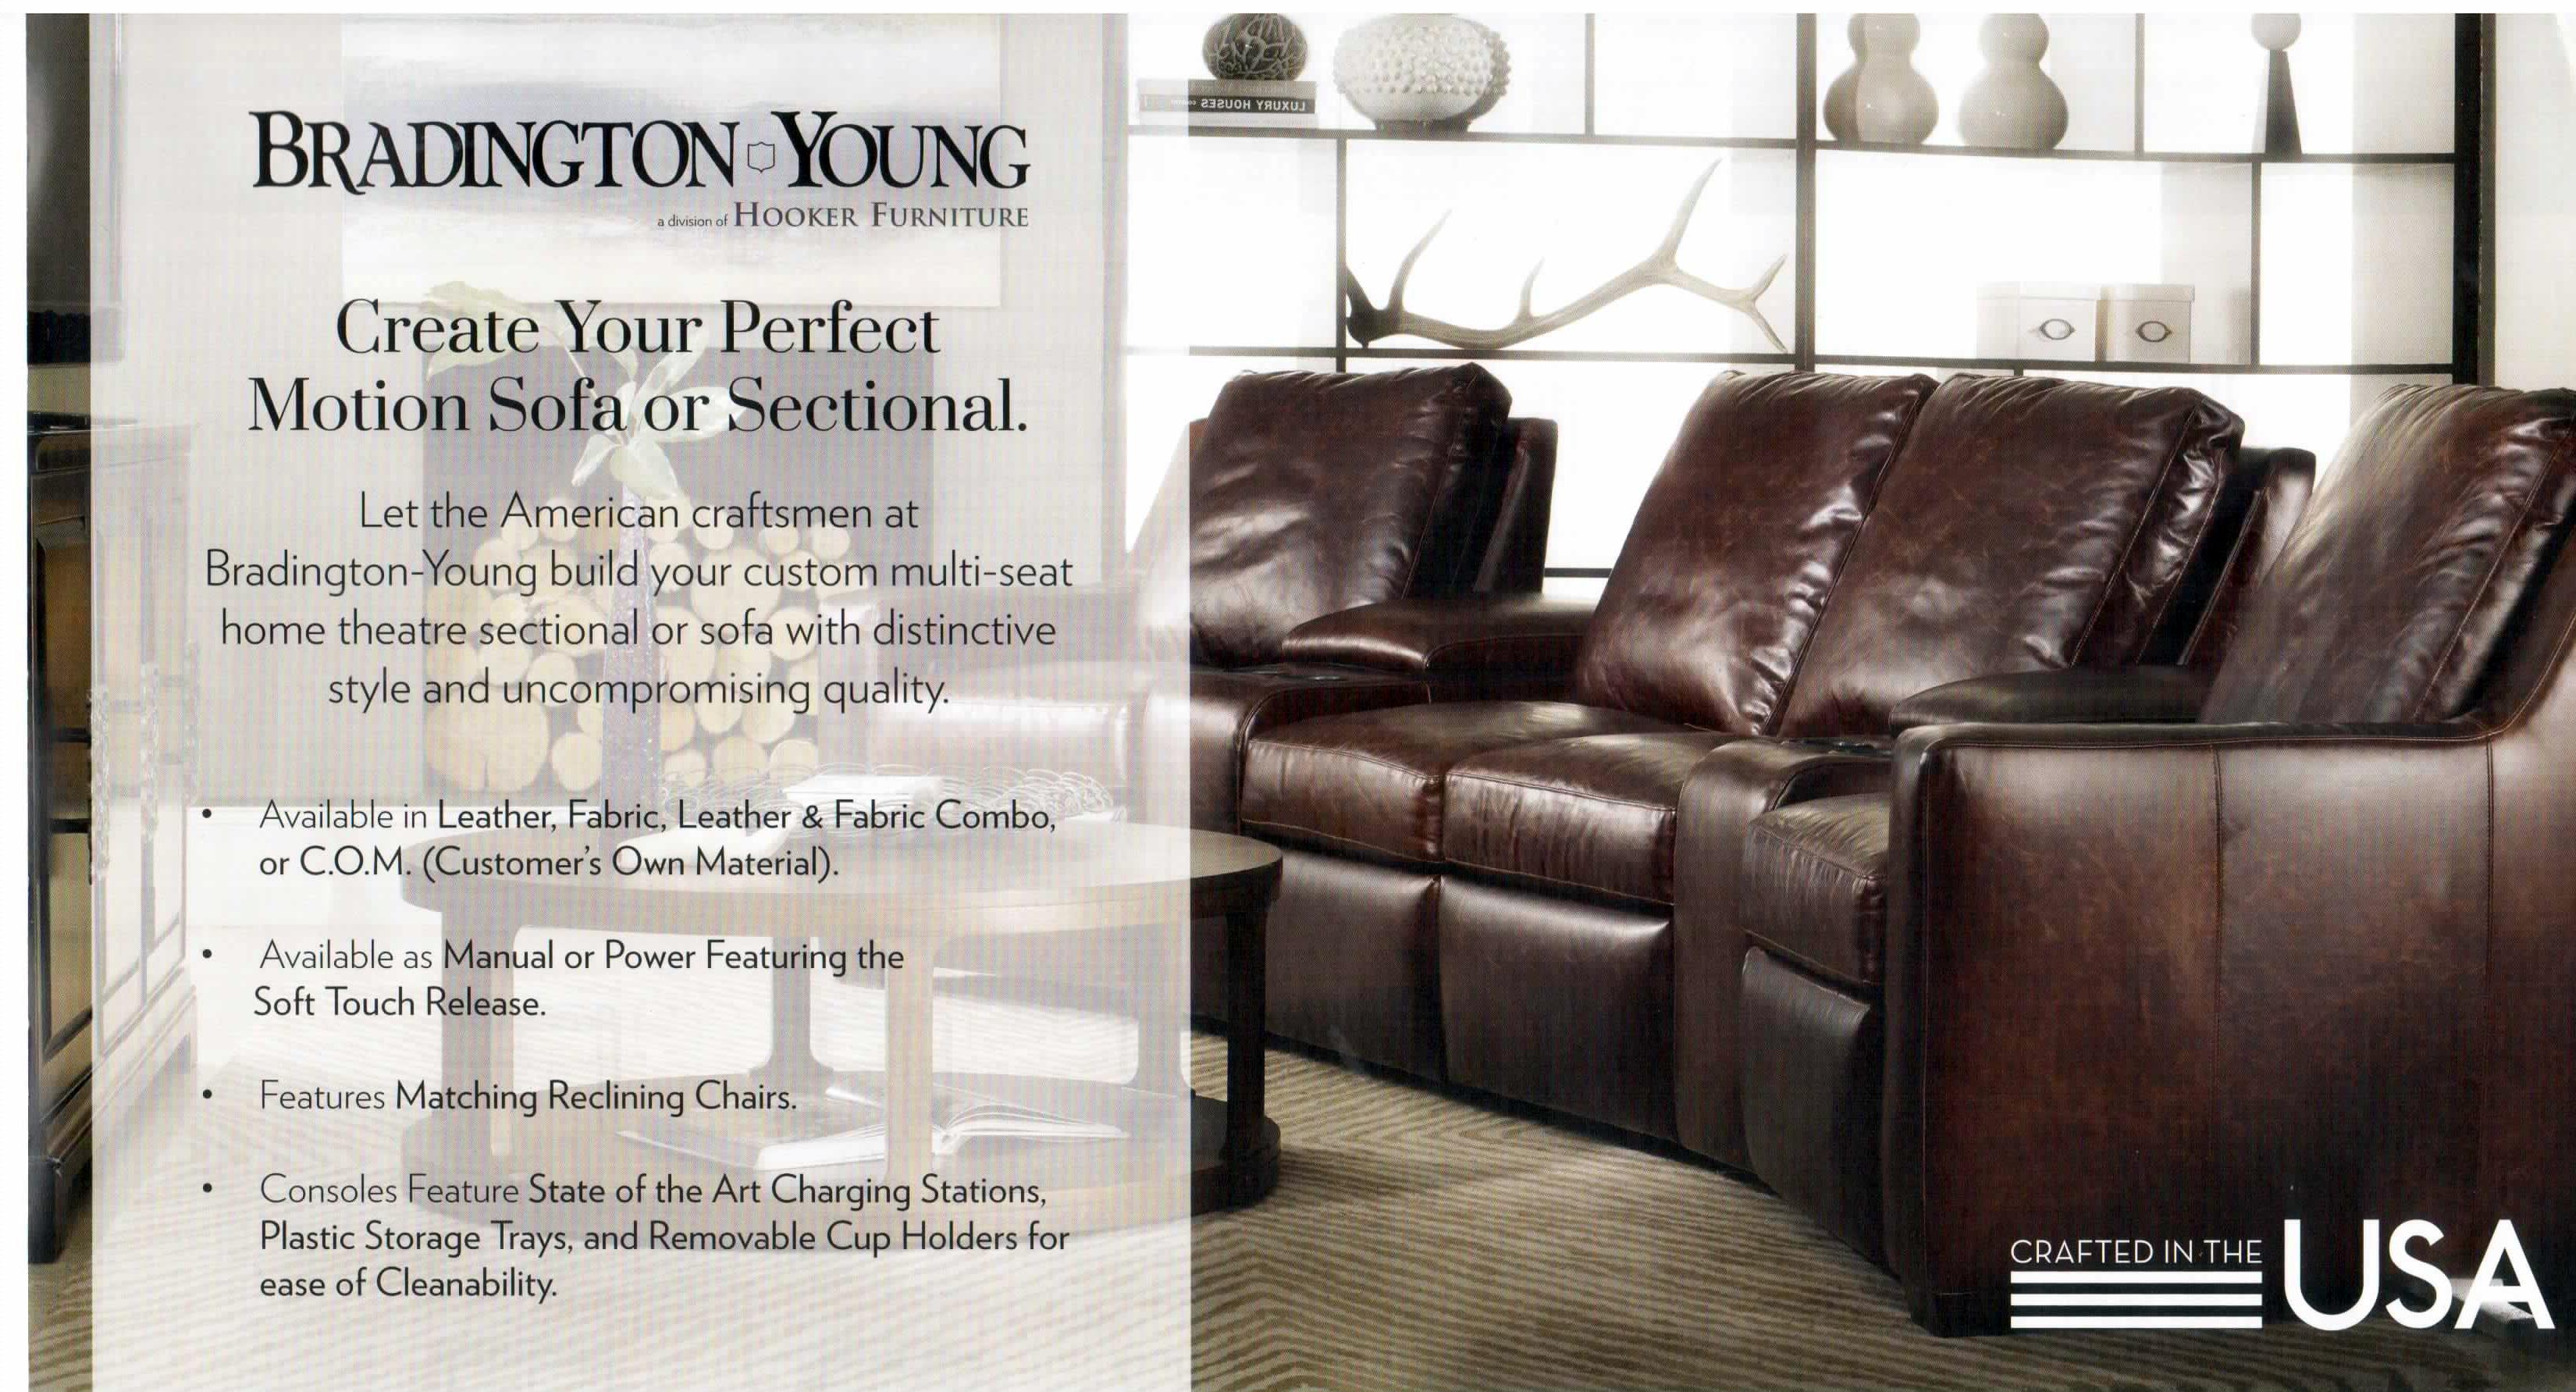 Bradington-Young 900 series luxury reclining furniture